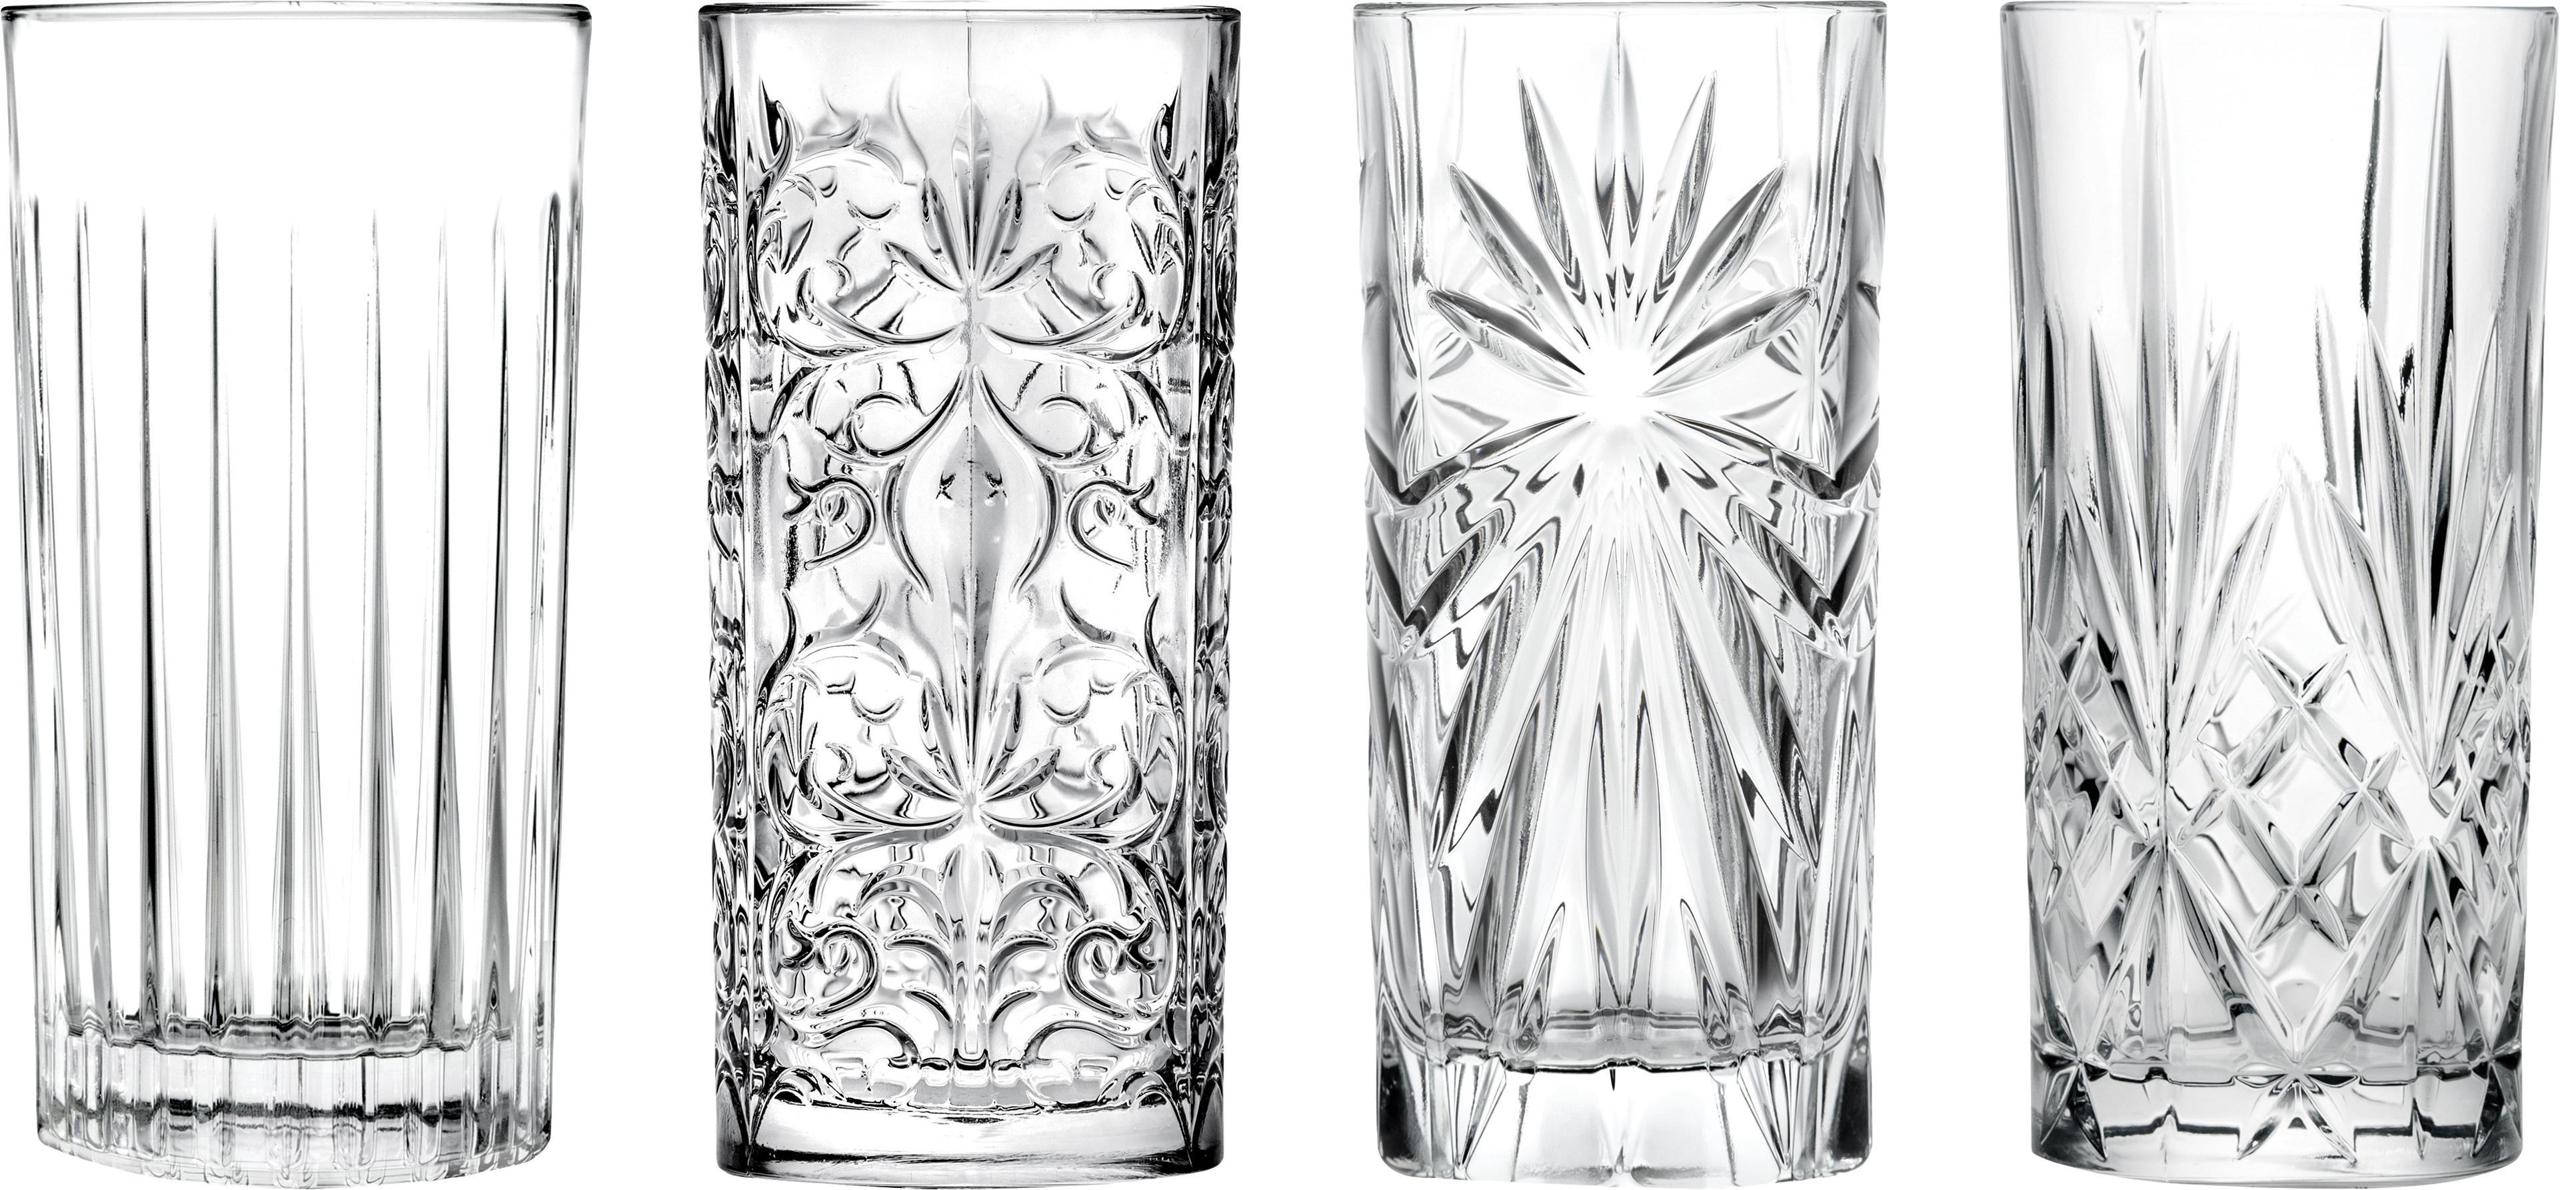 Vasos highball de cristal Bichiera, 4uds., Cristal, Transparente, Ø 7 x Al 15 cm